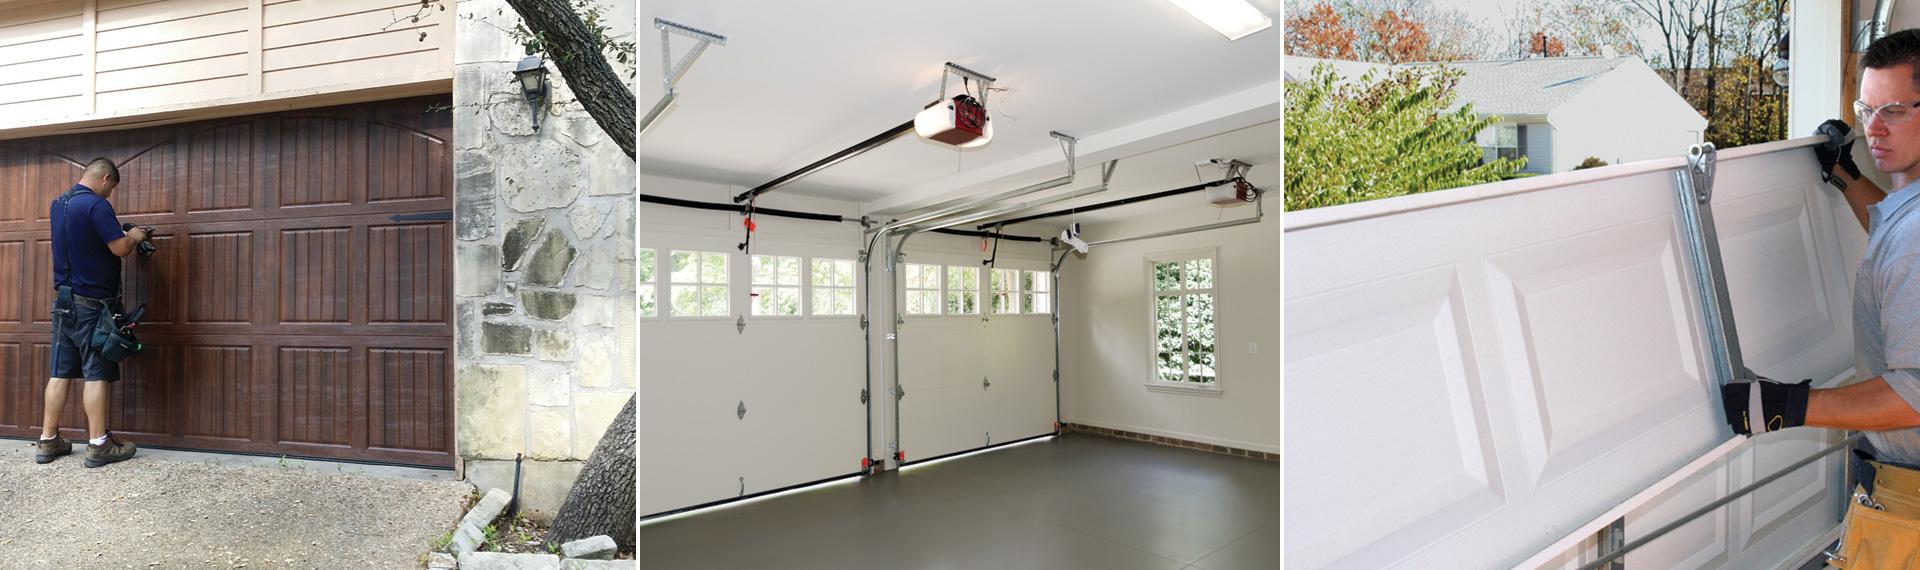 All Garage Door Services Palmyra NJ